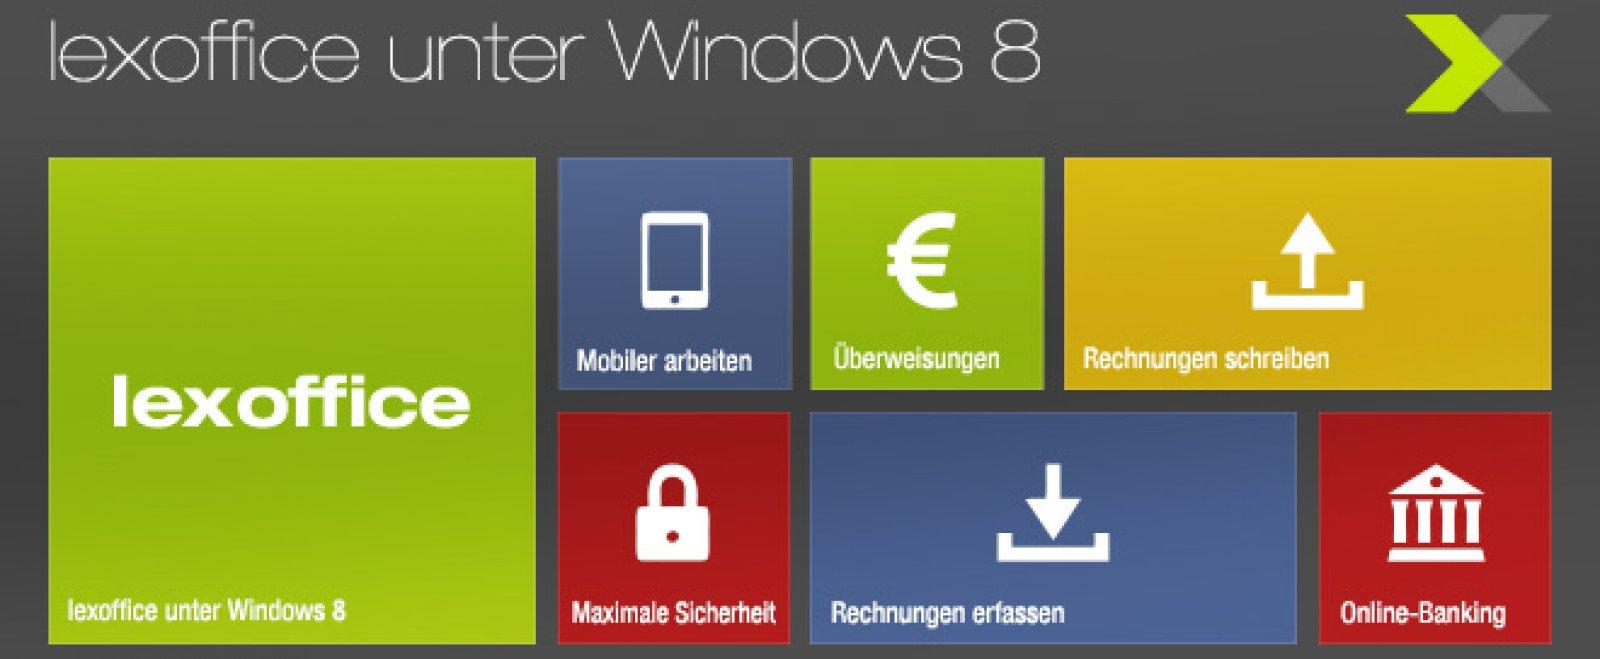 lexoffice unter Windows 8